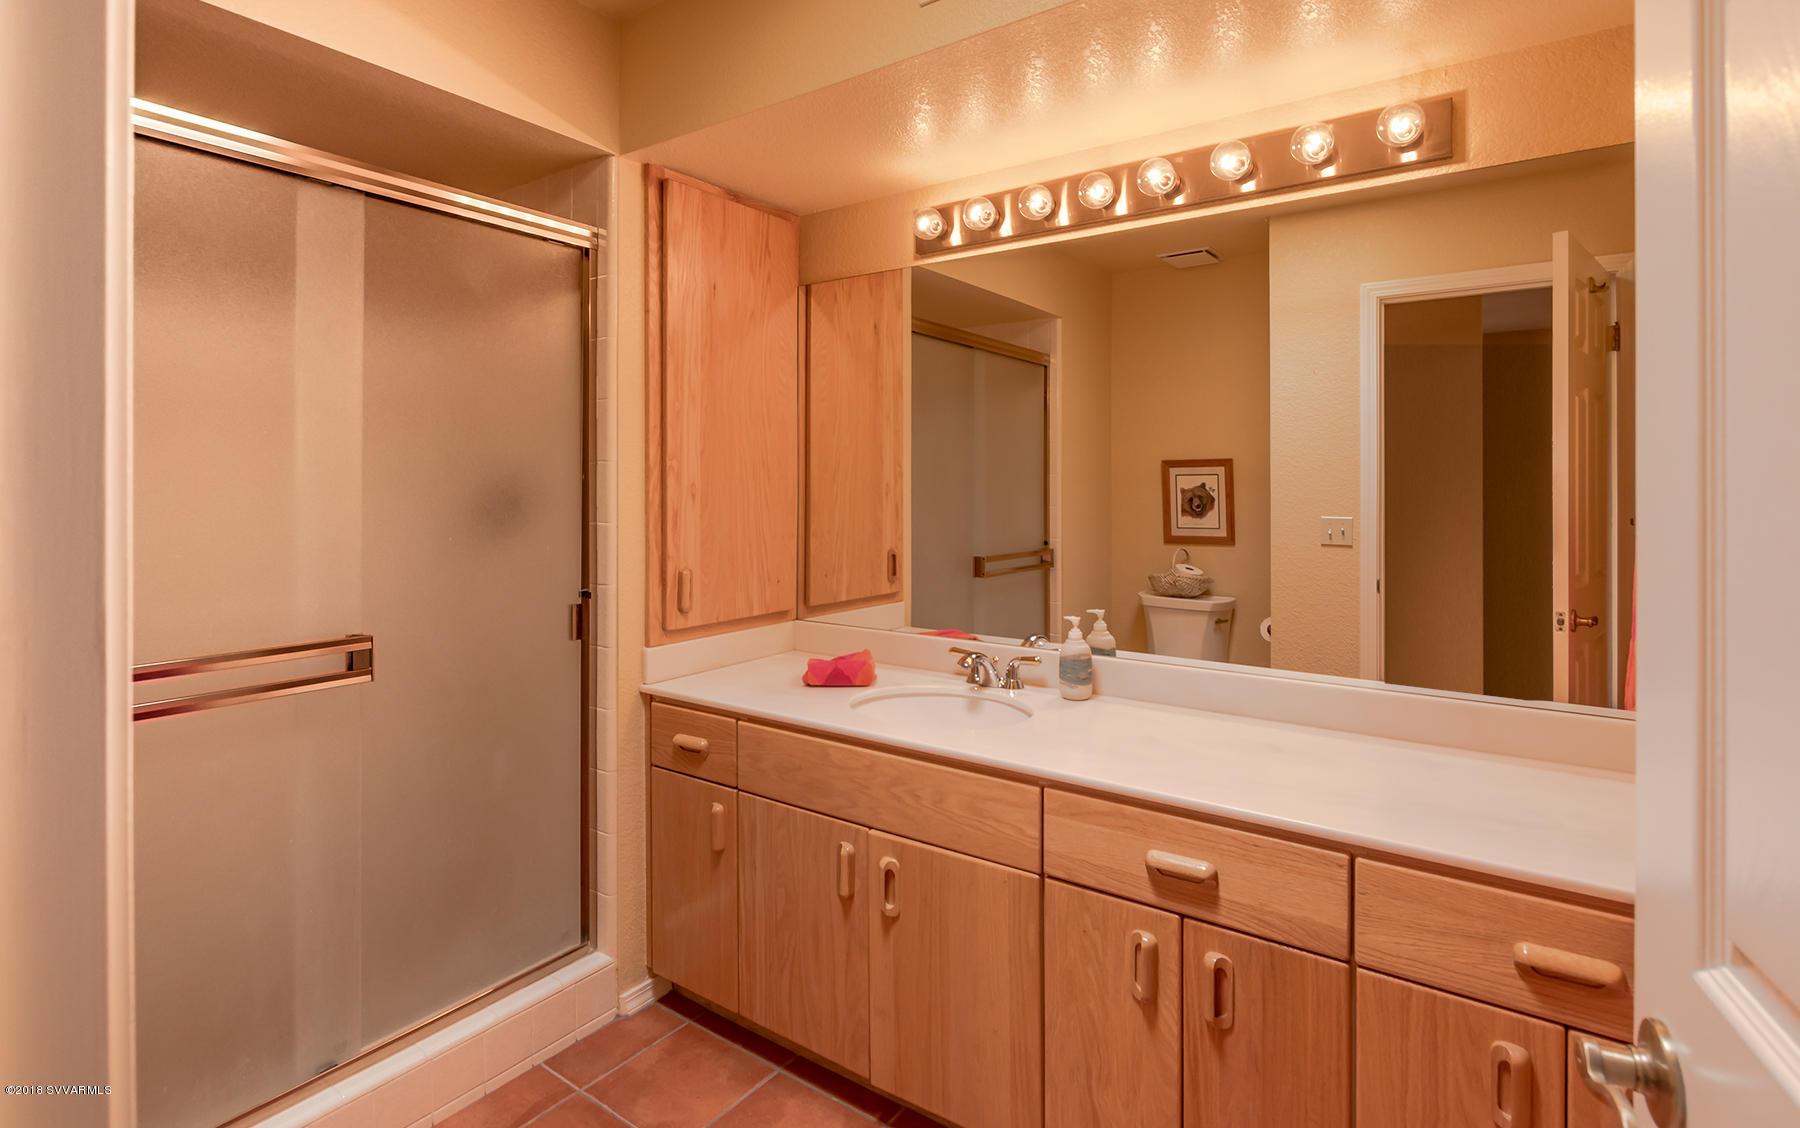 458 Tanglewood Tr Sedona, AZ 86351 - MLS #: 517577